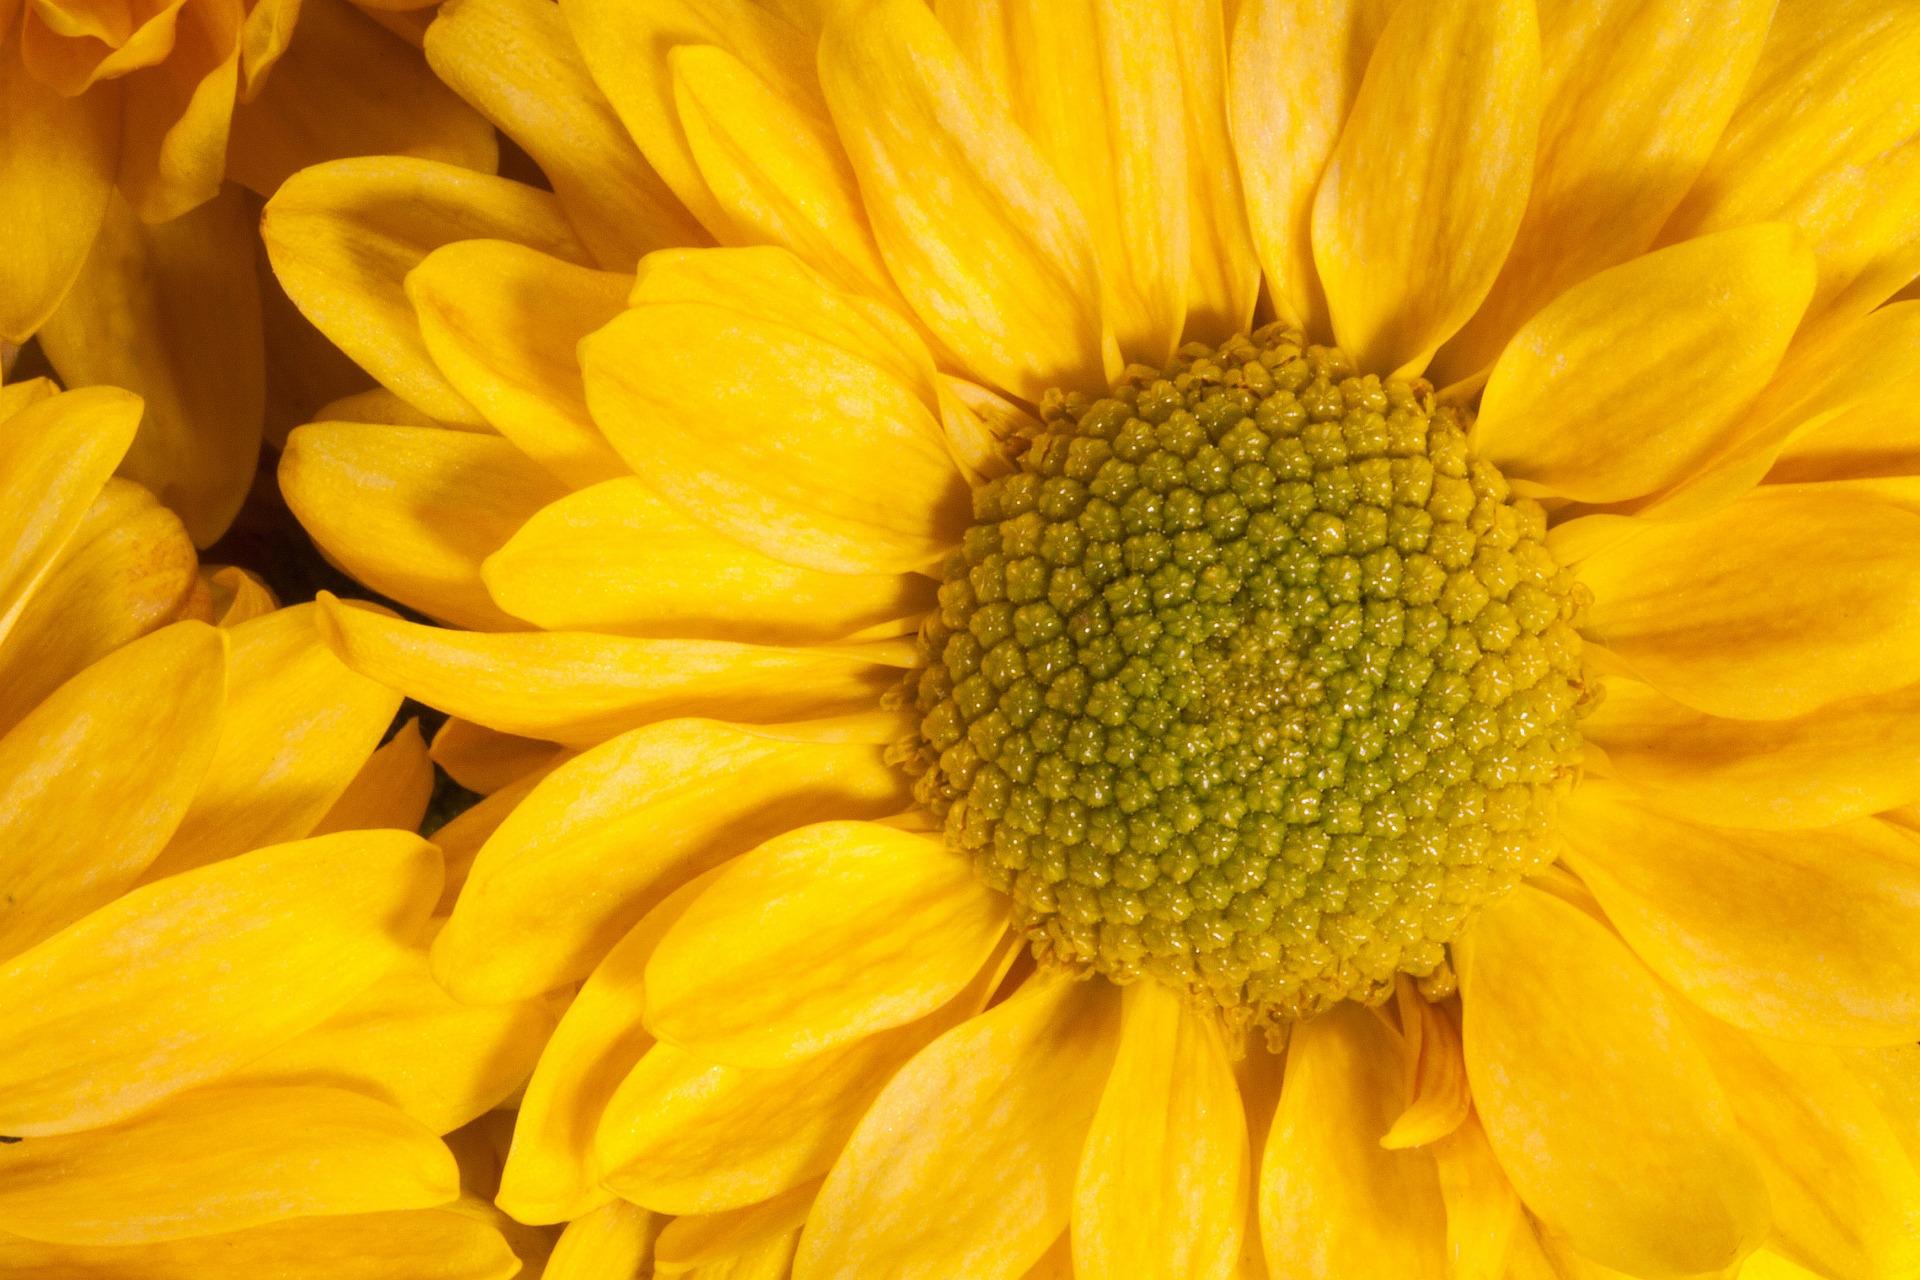 garden-chrysanthemum-201493_1920